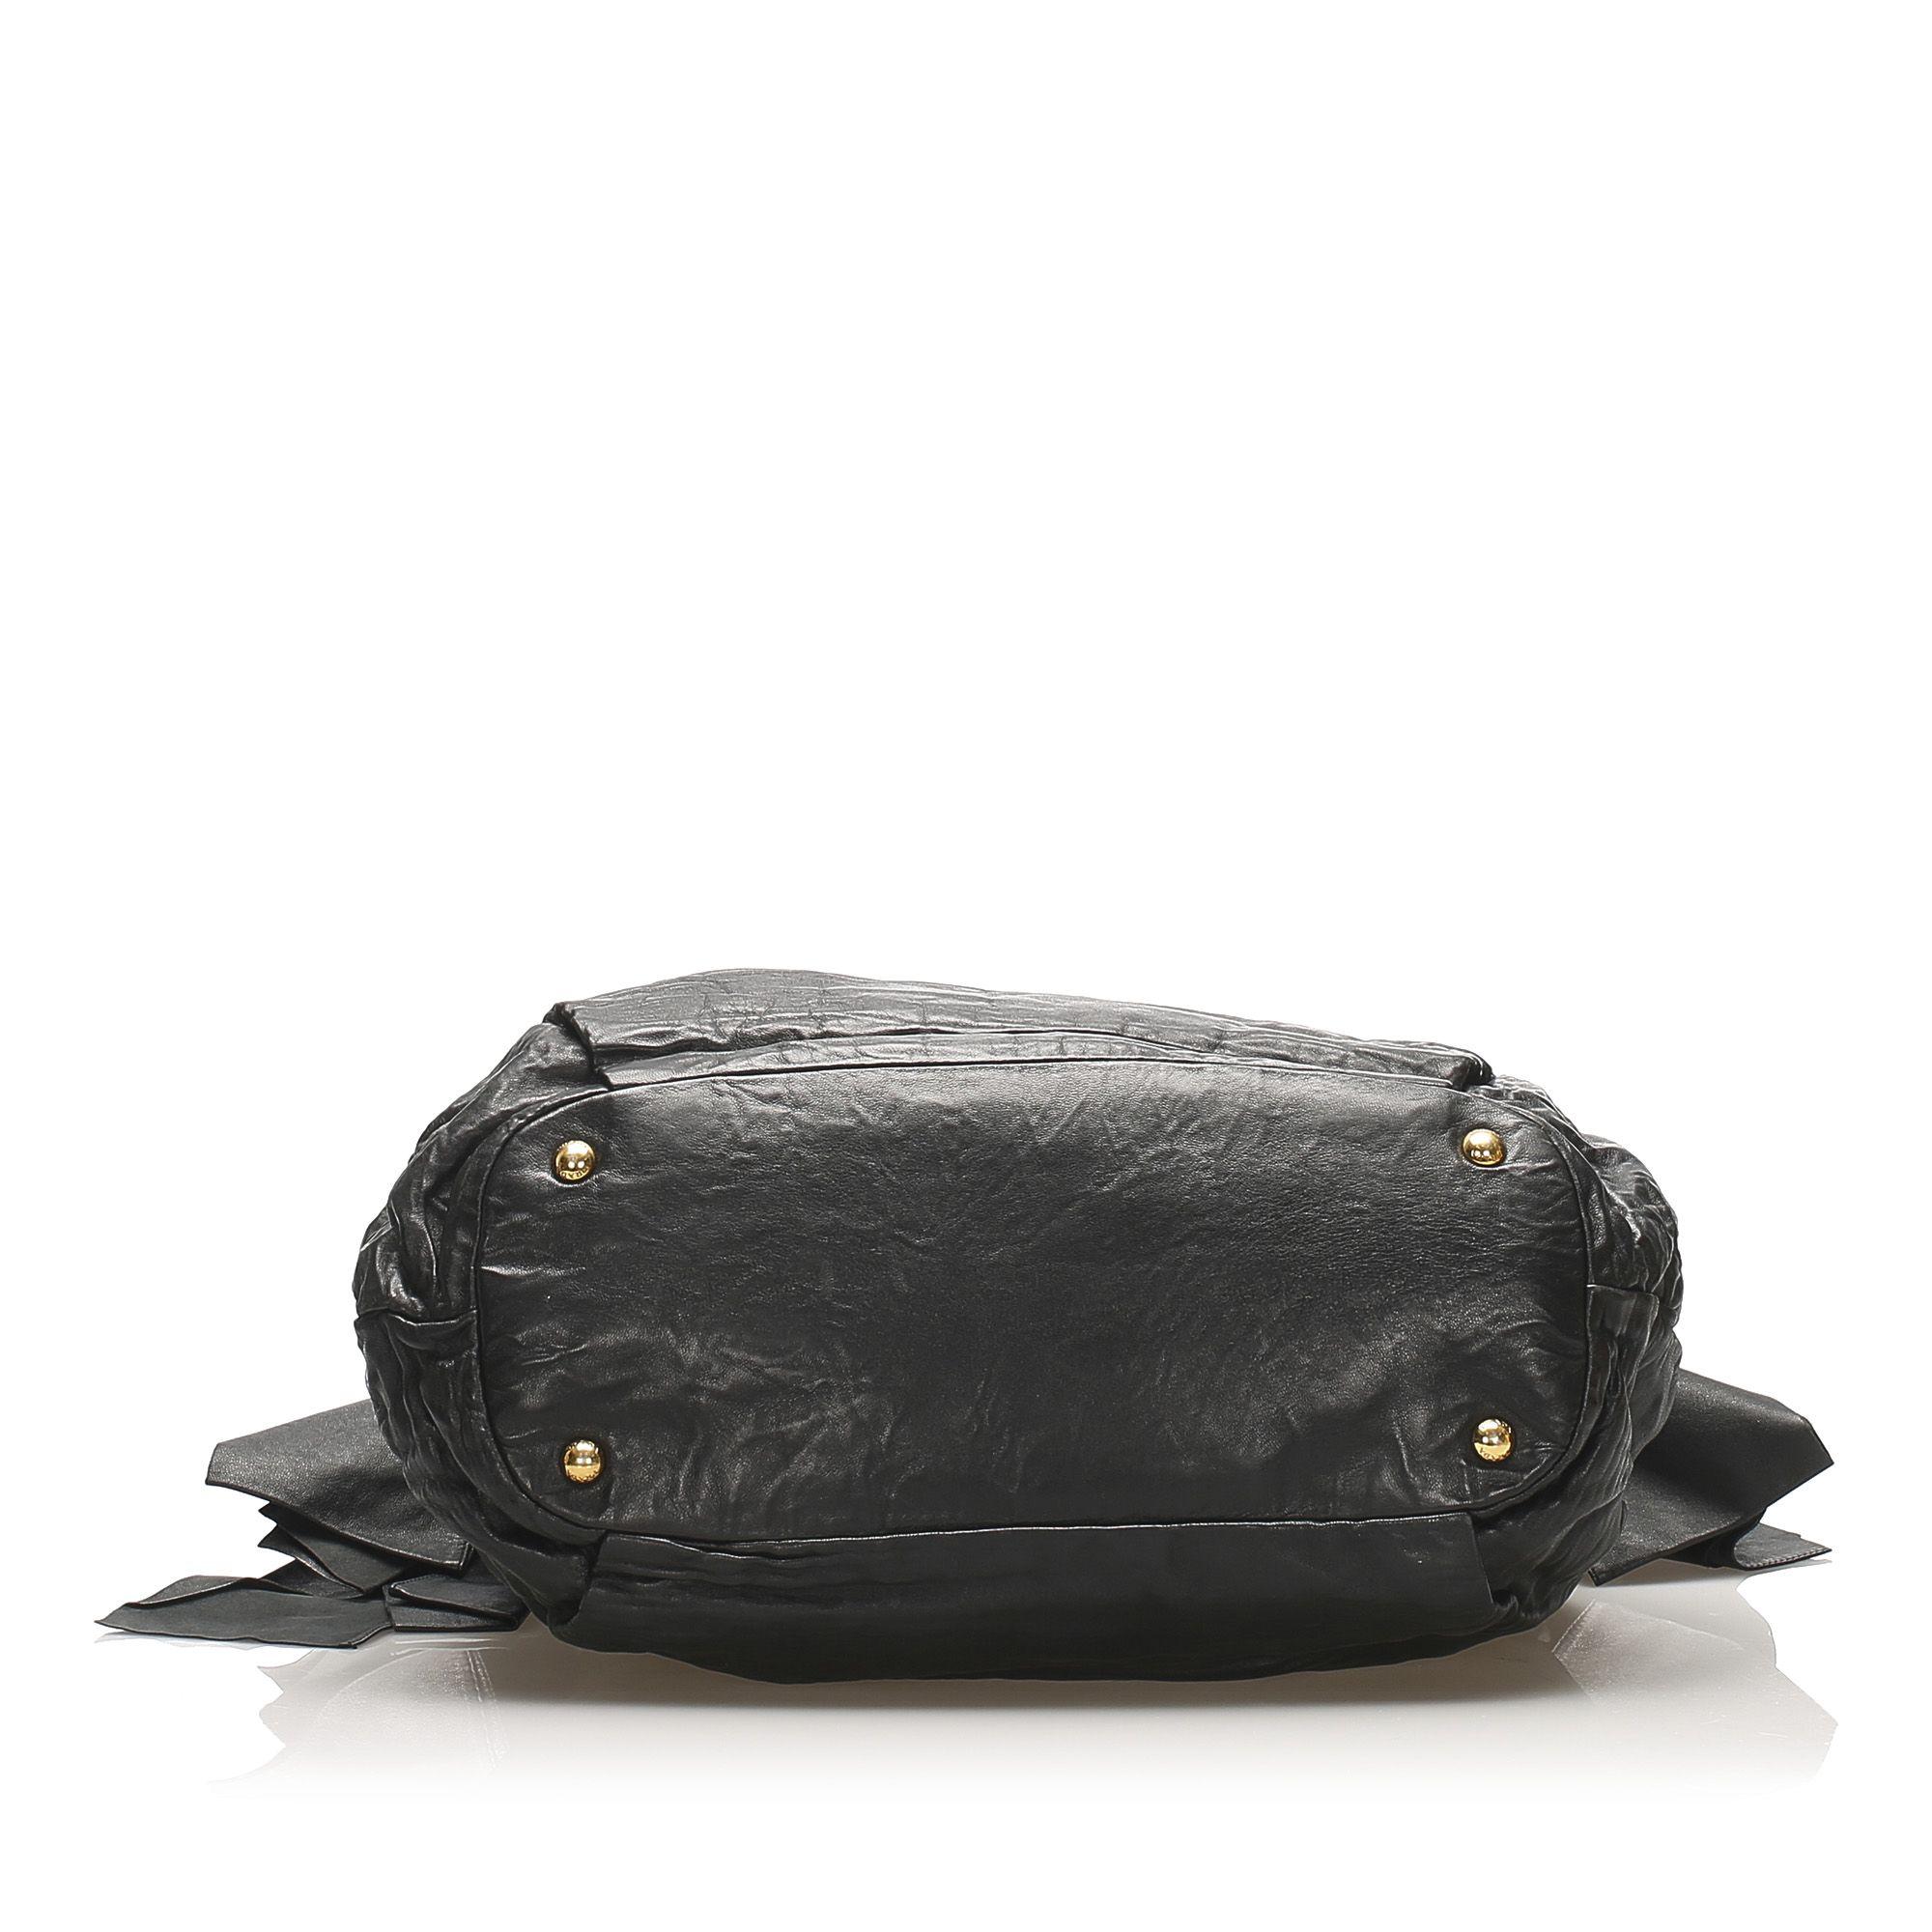 Vintage Prada Ribbon Leather Satchel Black